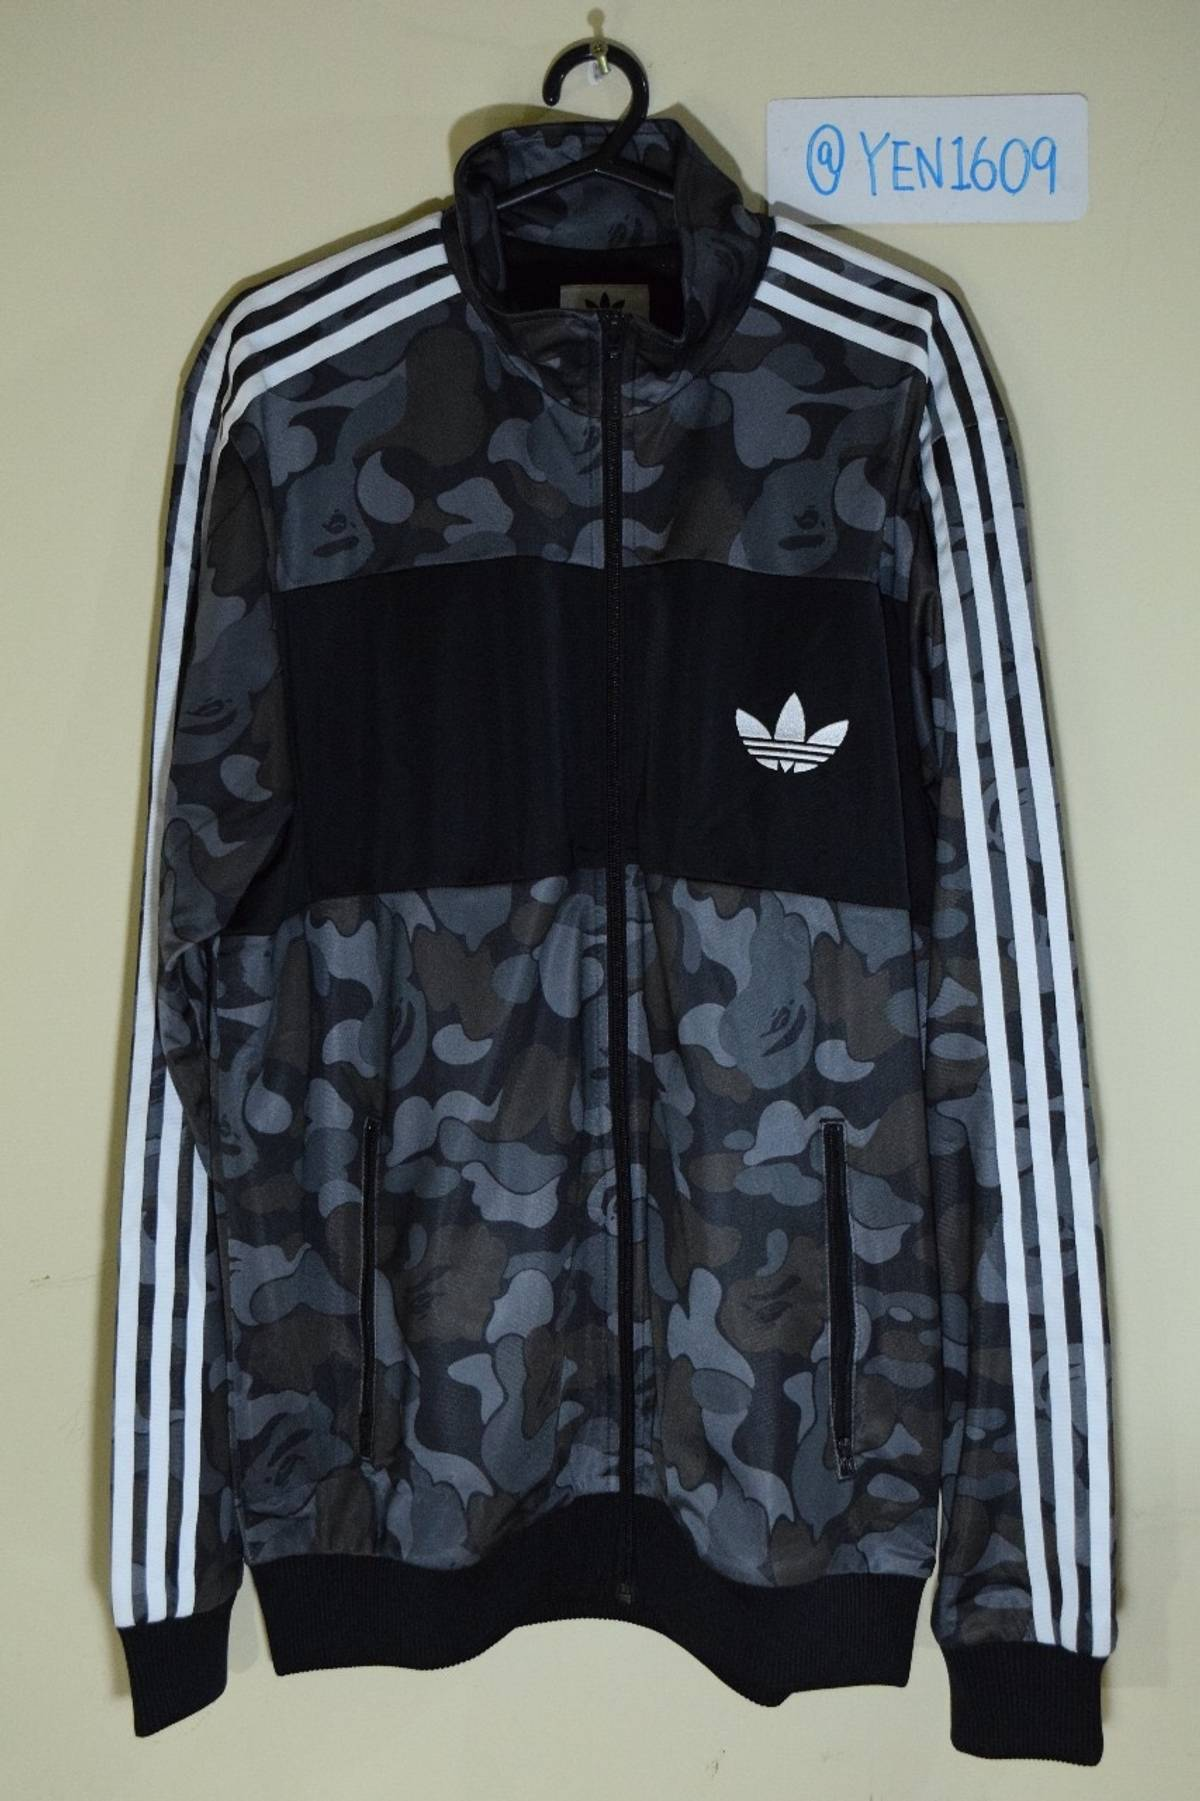 fffb2fb7 Adidas × Bape ×. Bape x Adidas ABC Camo Track Jacket Black - Size L - Very  Mint Condition ...